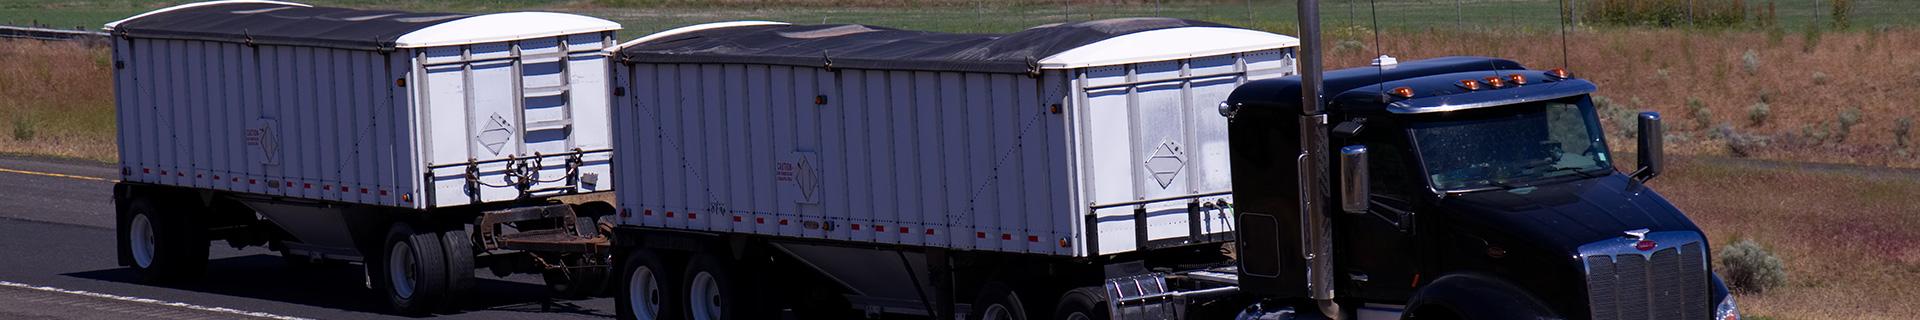 Safe Driving Behaviors for Commercial Motor Vehicles (CMVs)